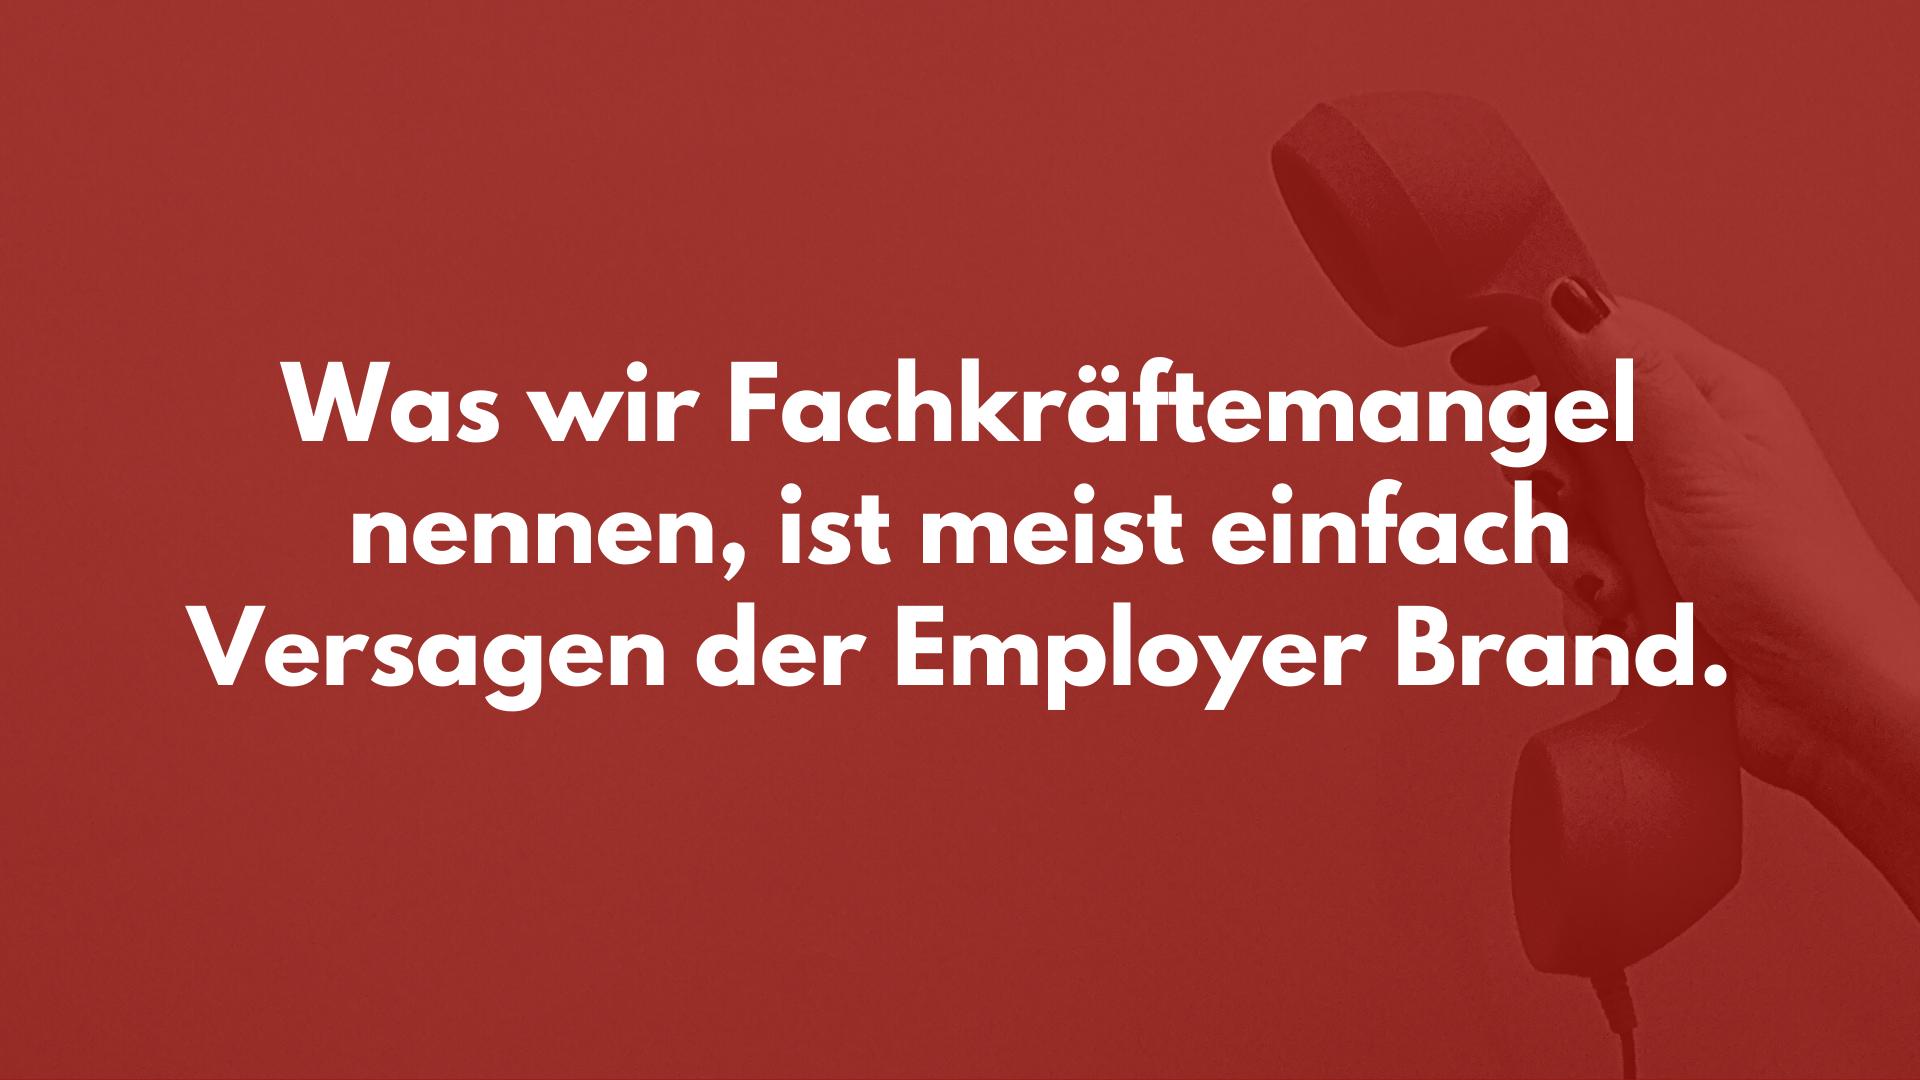 Employer Branding 2020 (5)